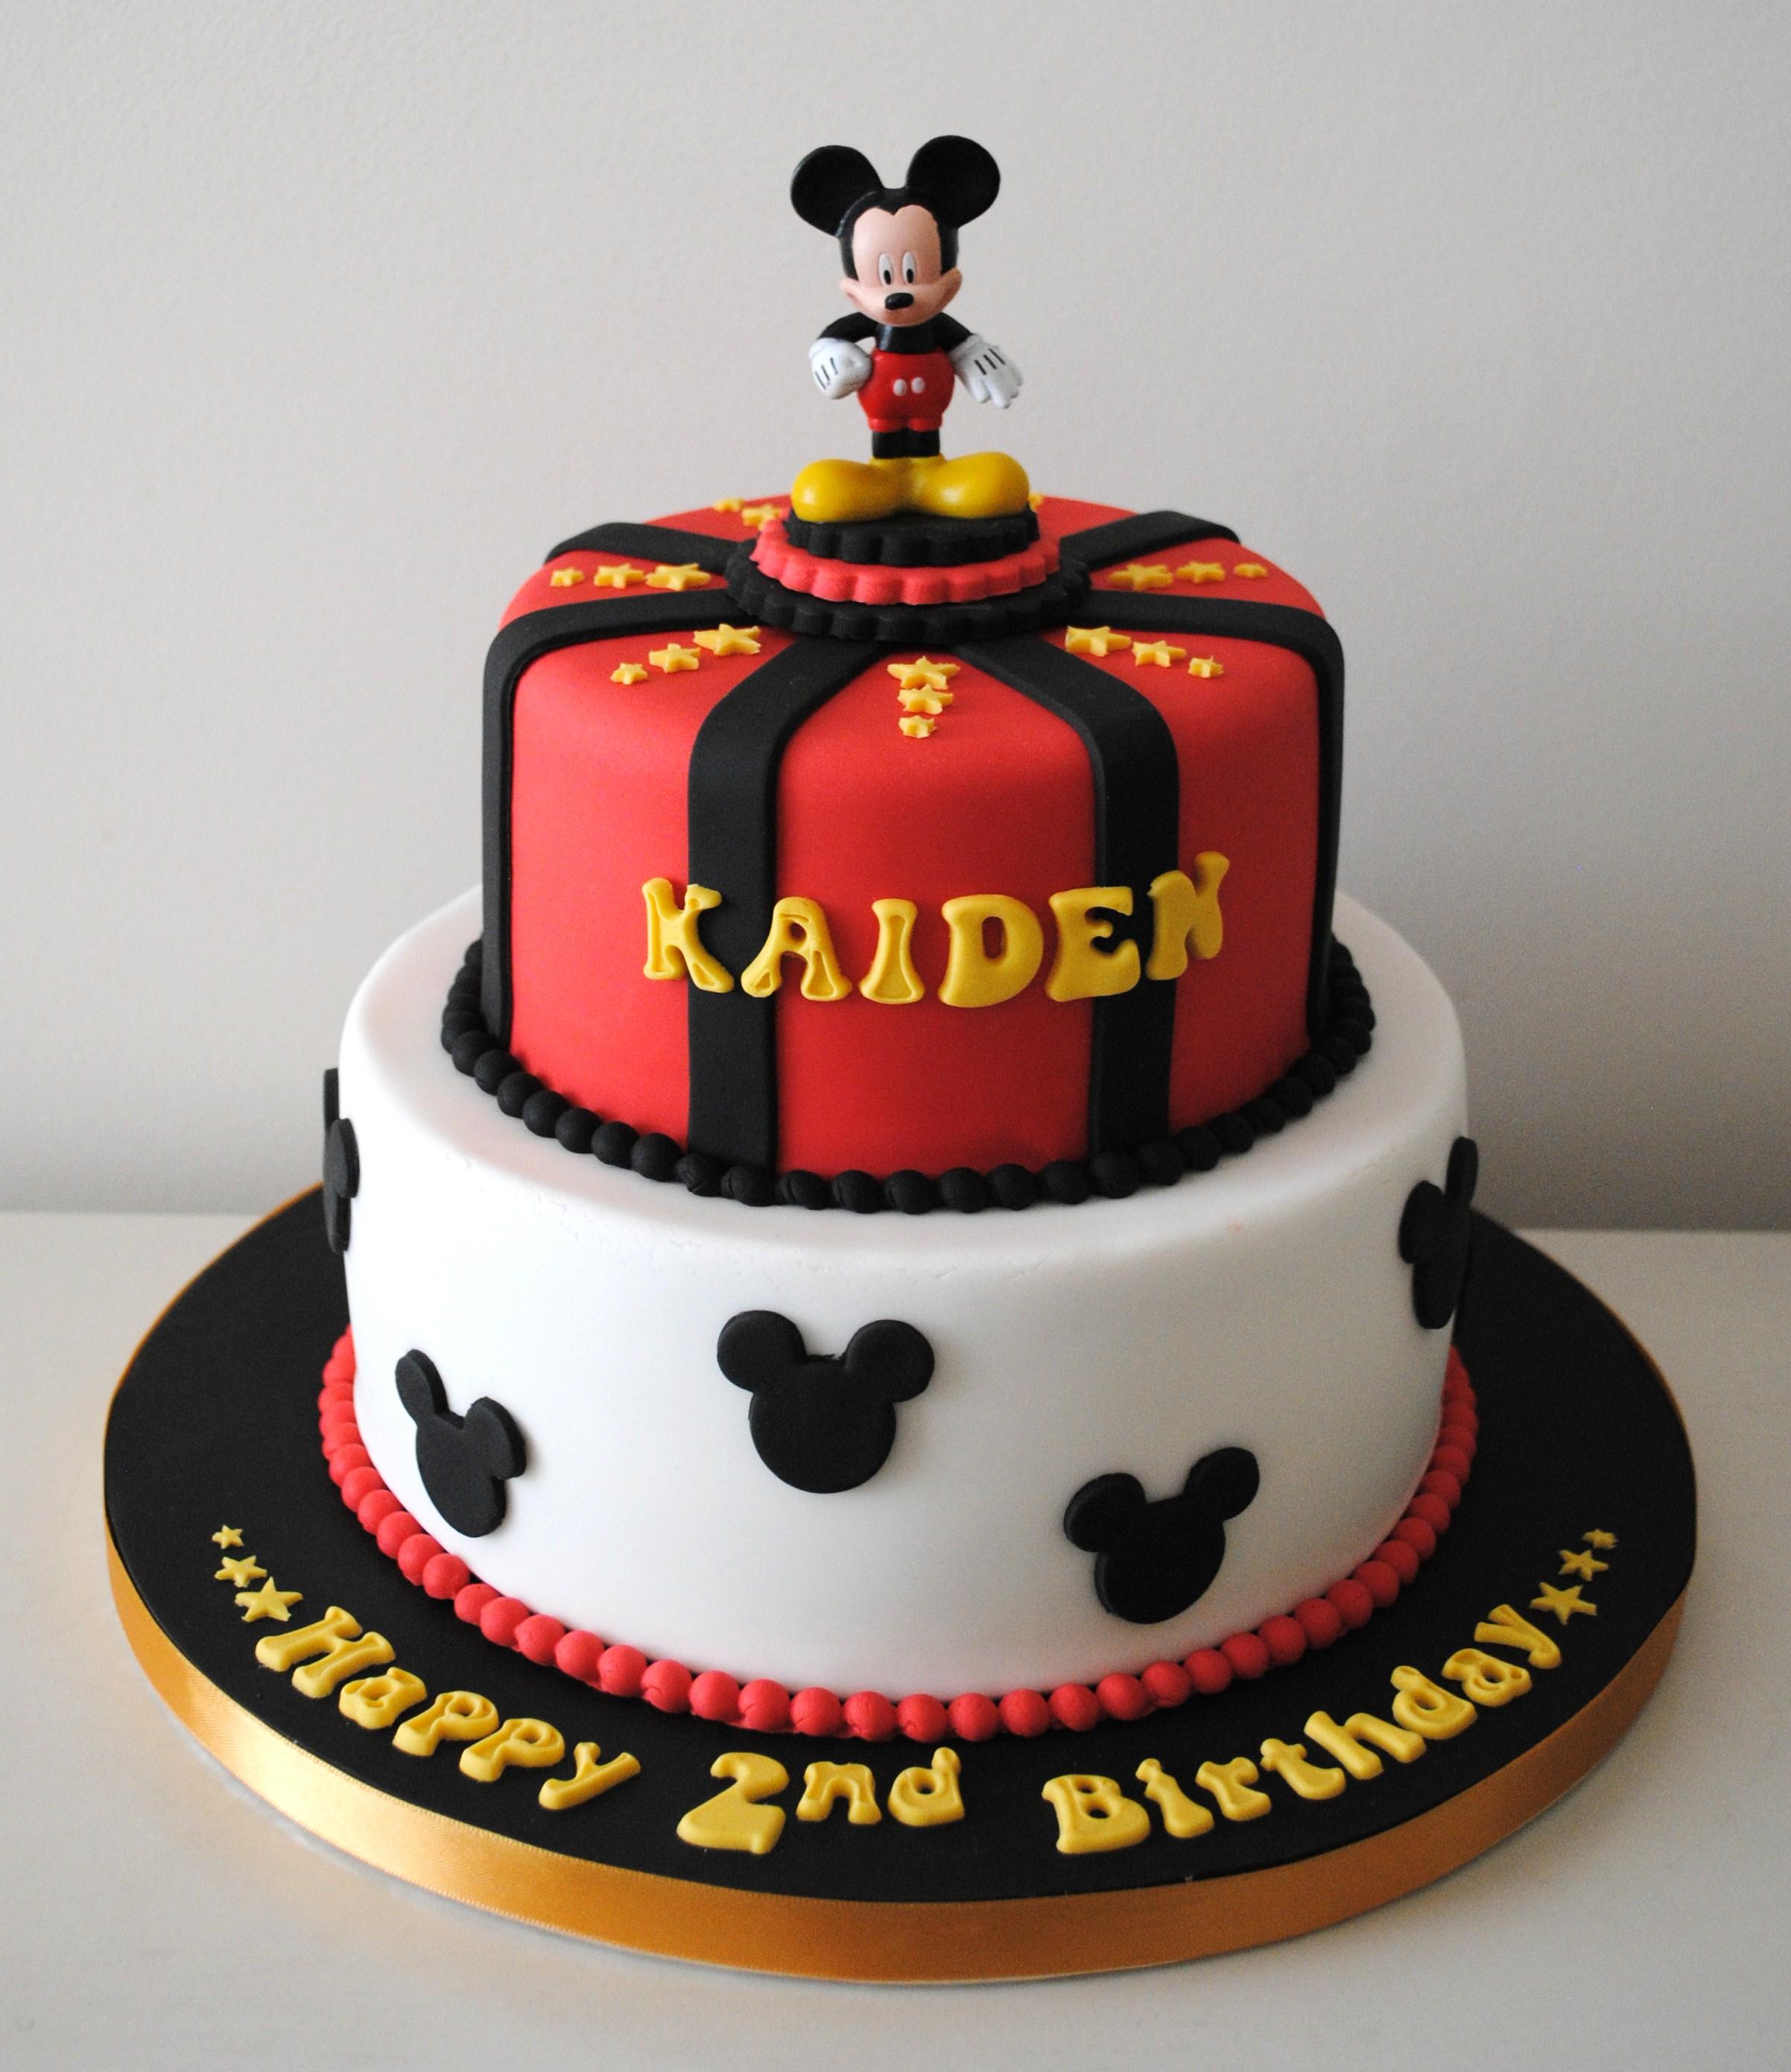 cake occasion cupcakes cupcake birthday celebration party happy